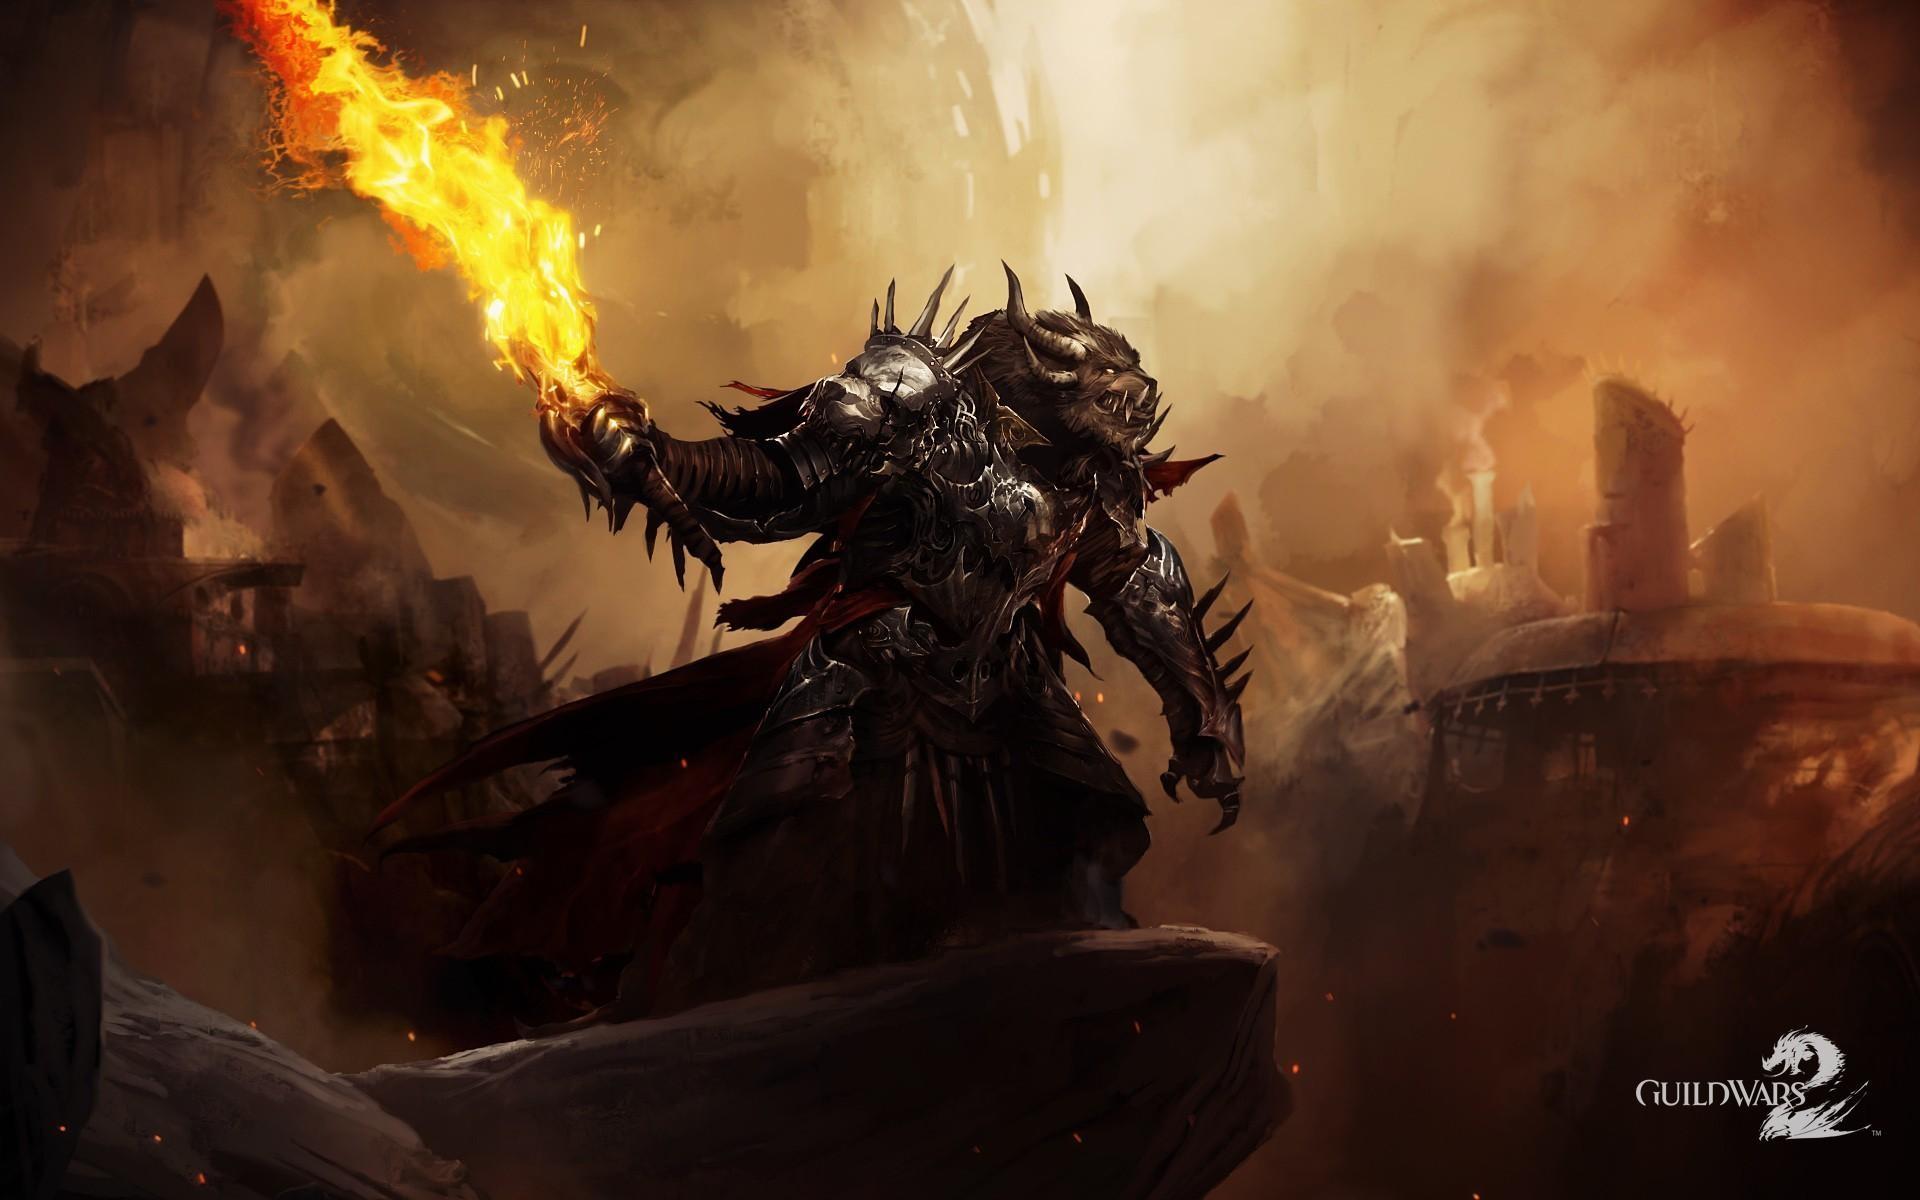 Guild Wars 2 Video Games Charr Wallpapers Hd Desktop: Dark Souls Bonfire Wallpaper (78+ Images